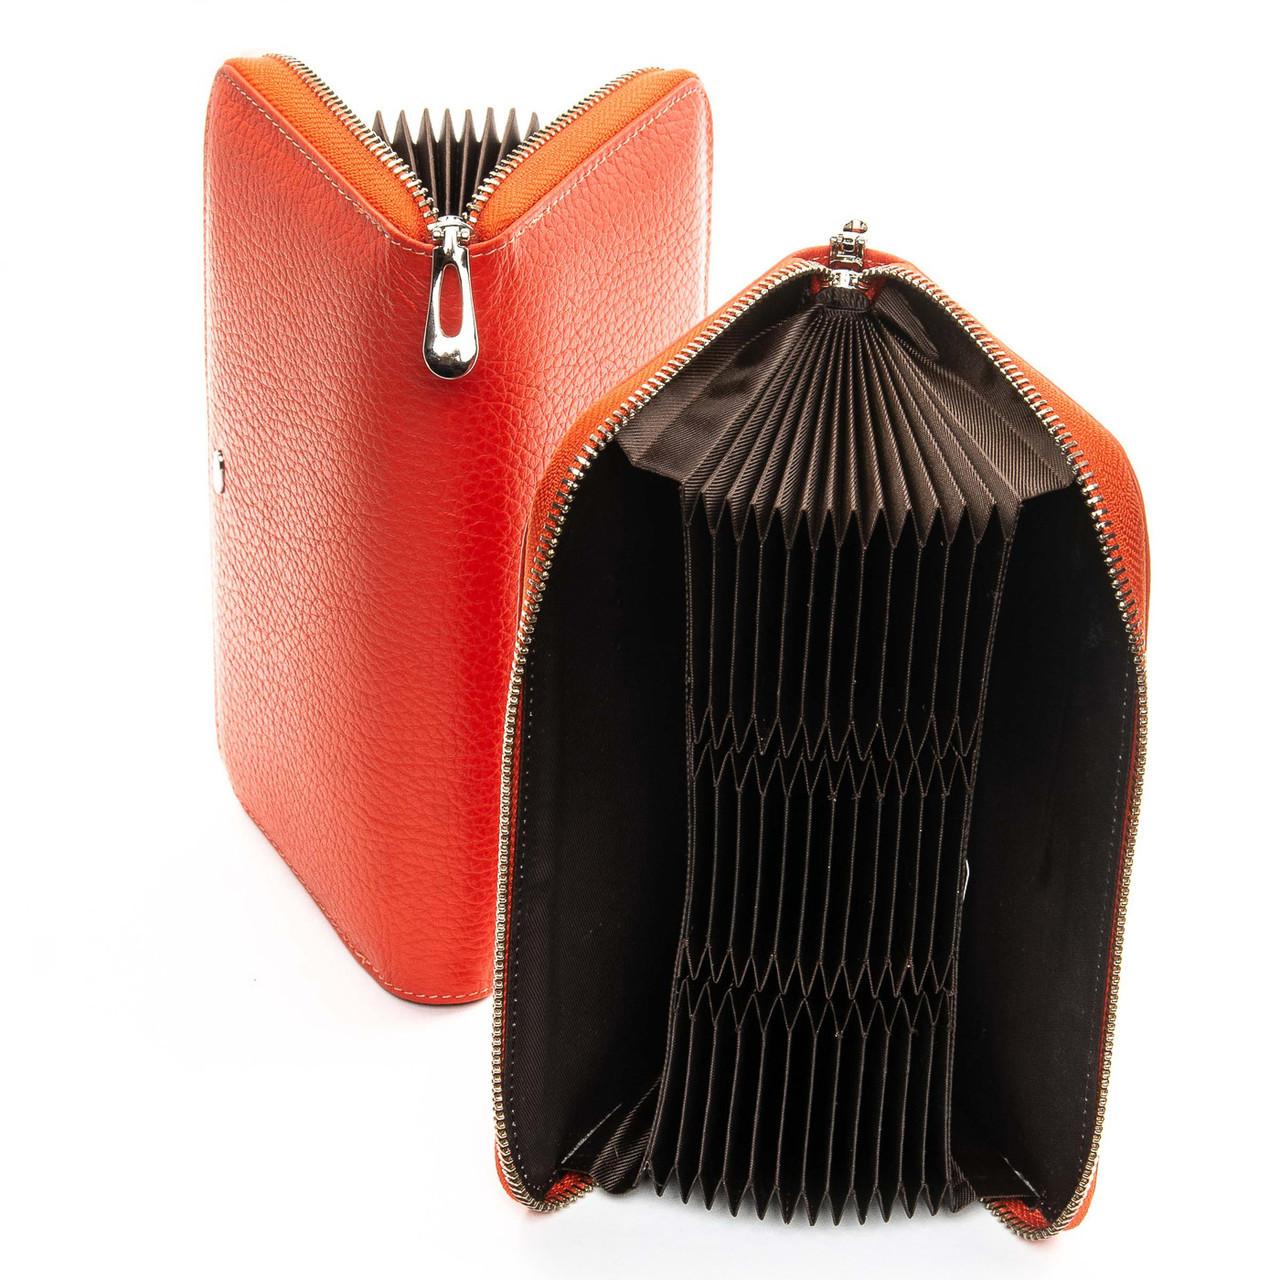 Визитница - кошелек на змейке, цвет - оранжевый, Classic кожа DR. BOND (WS-8 orange)